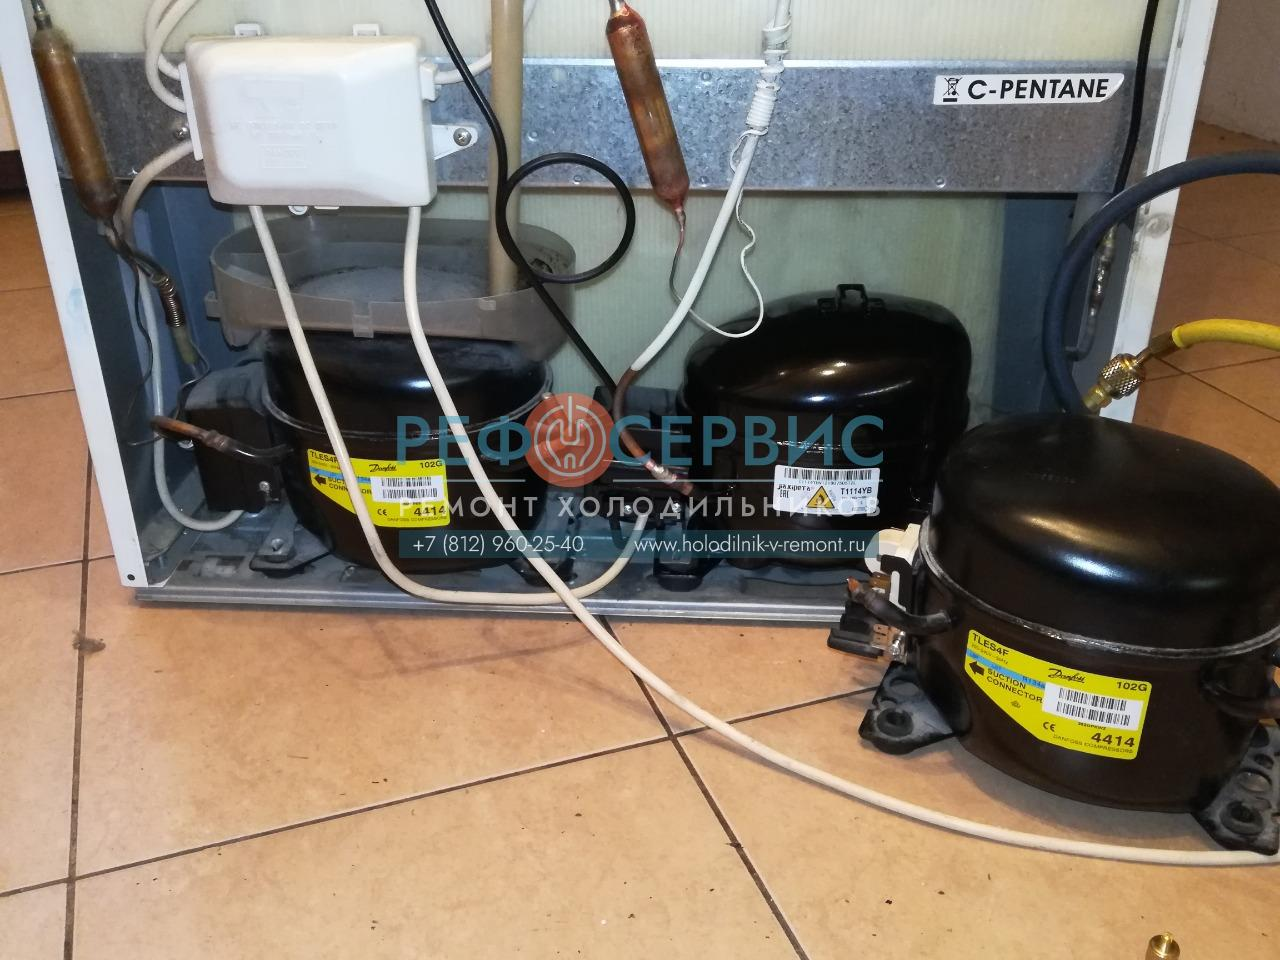 Замена компрессора в холодильнике ARISTON MBA2185.0189